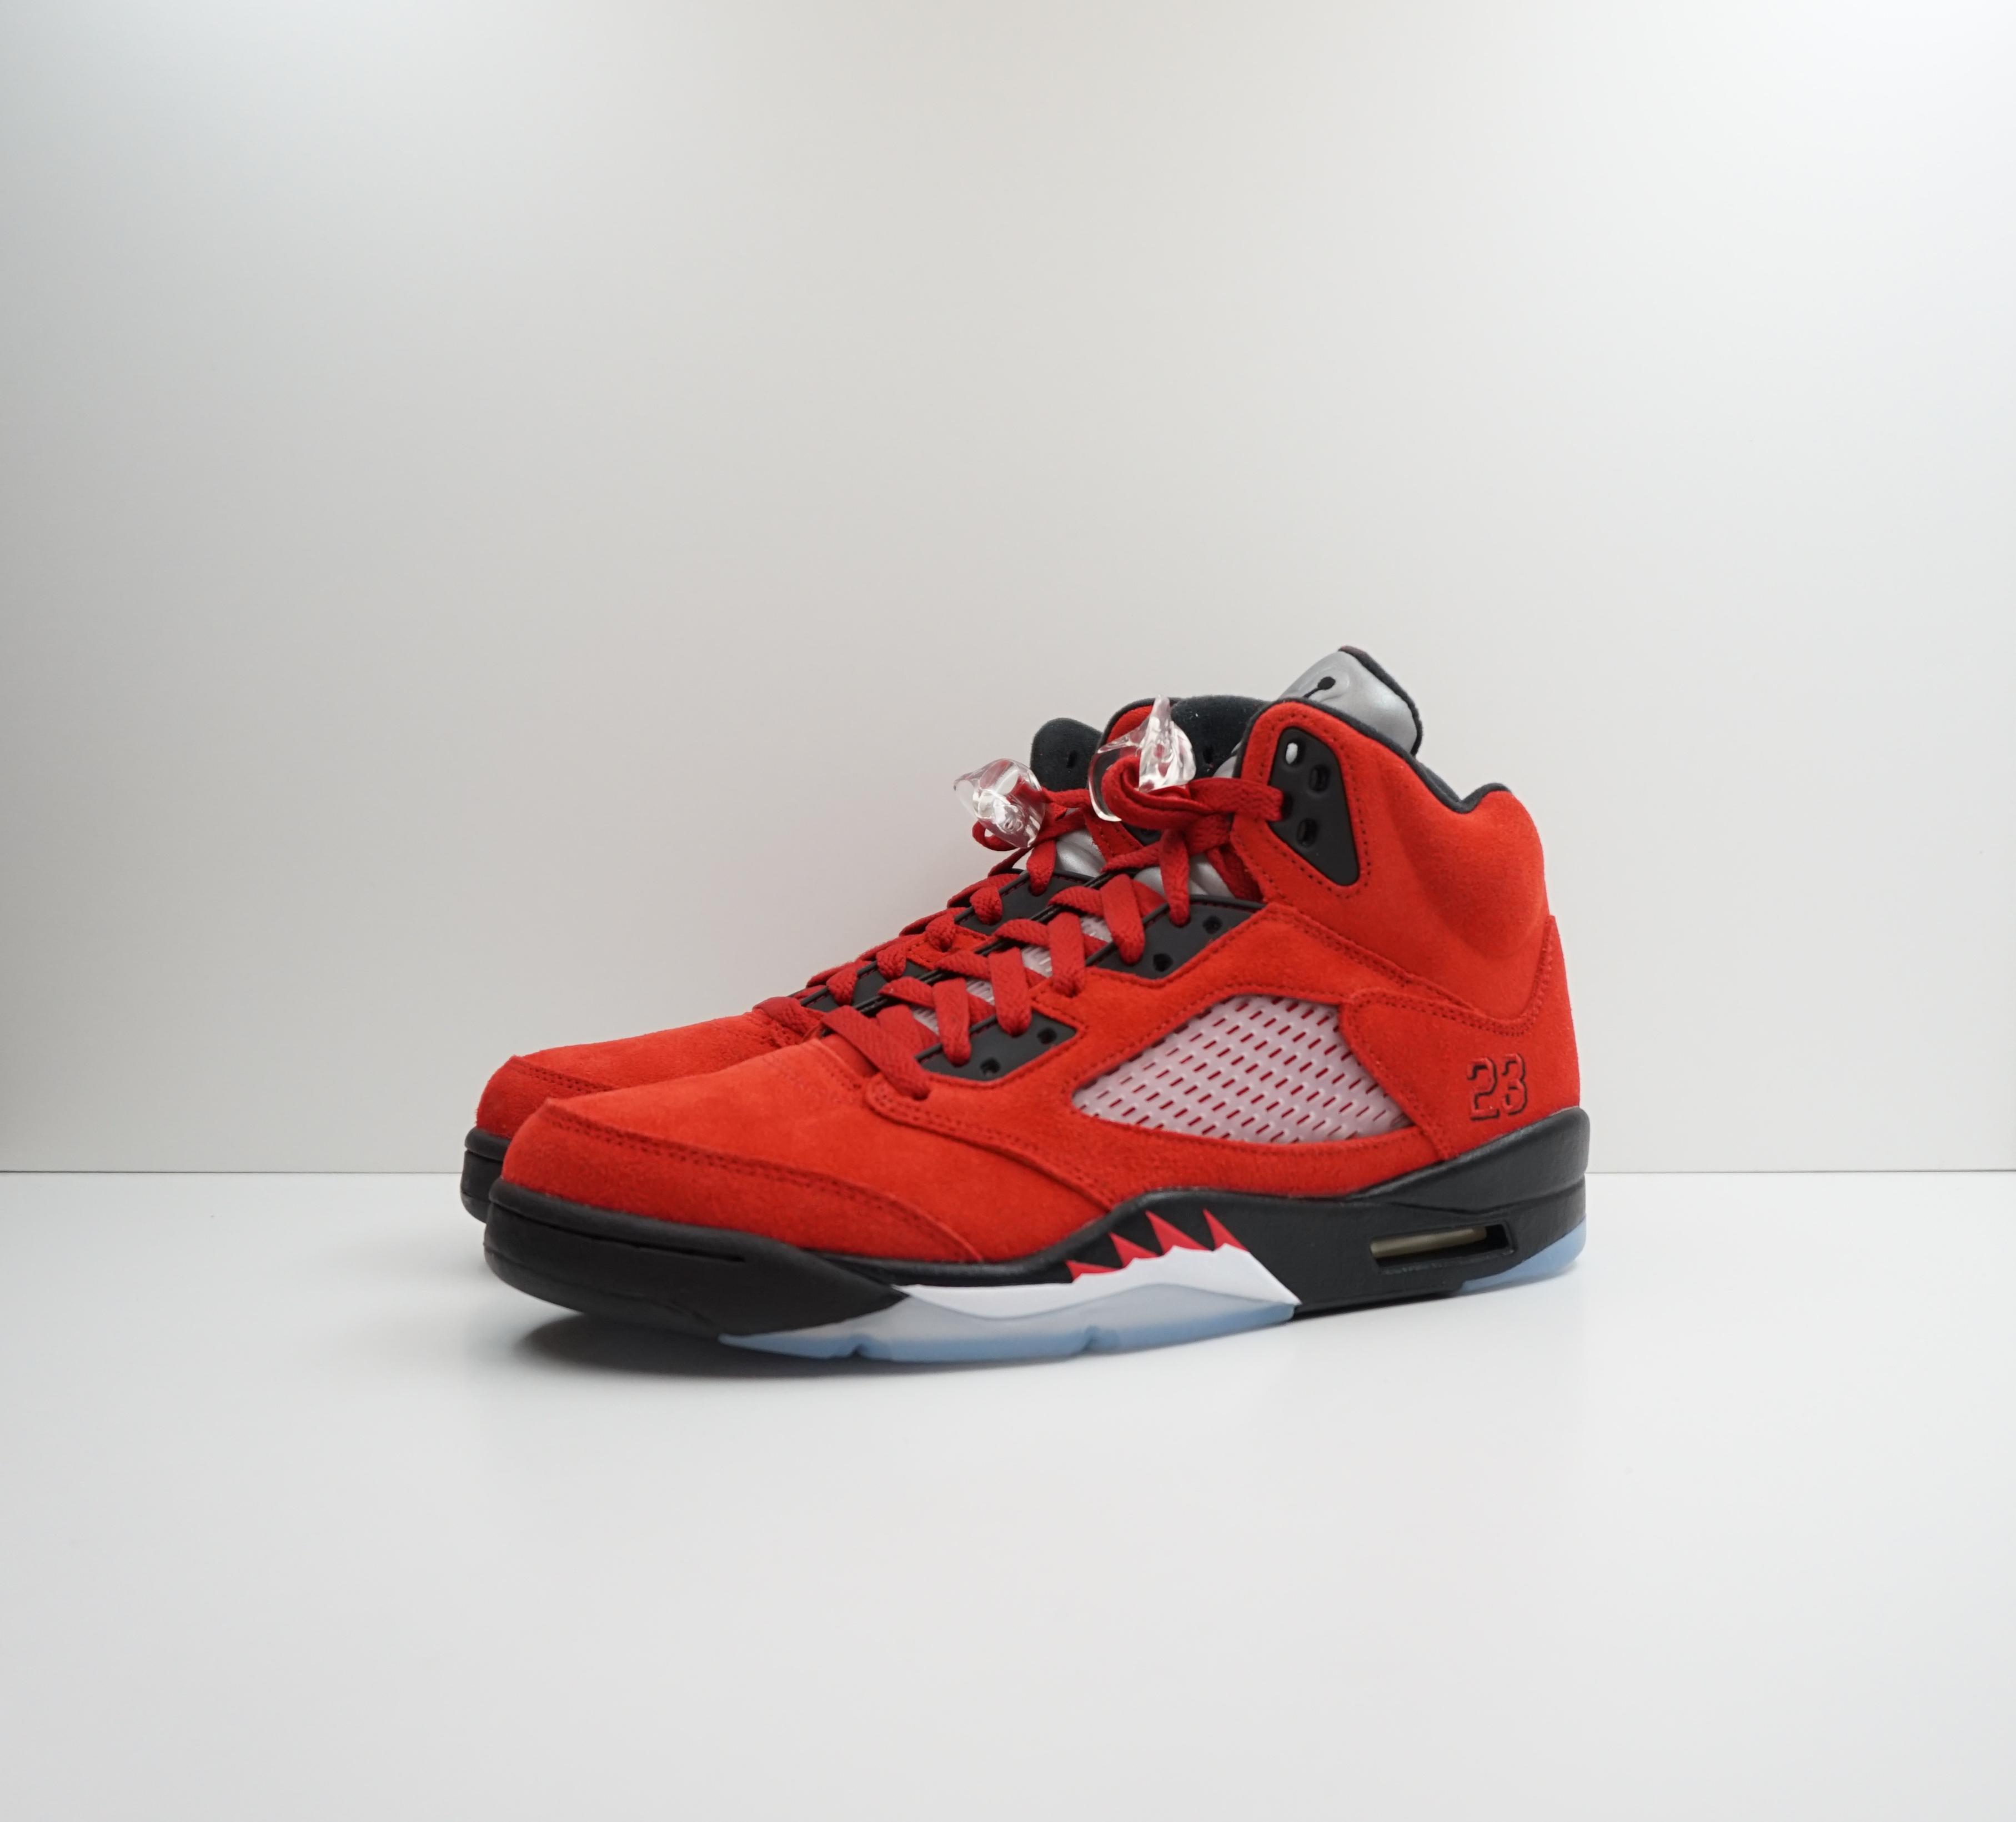 Jordan 5 Retro Raging Bull Red (2021)